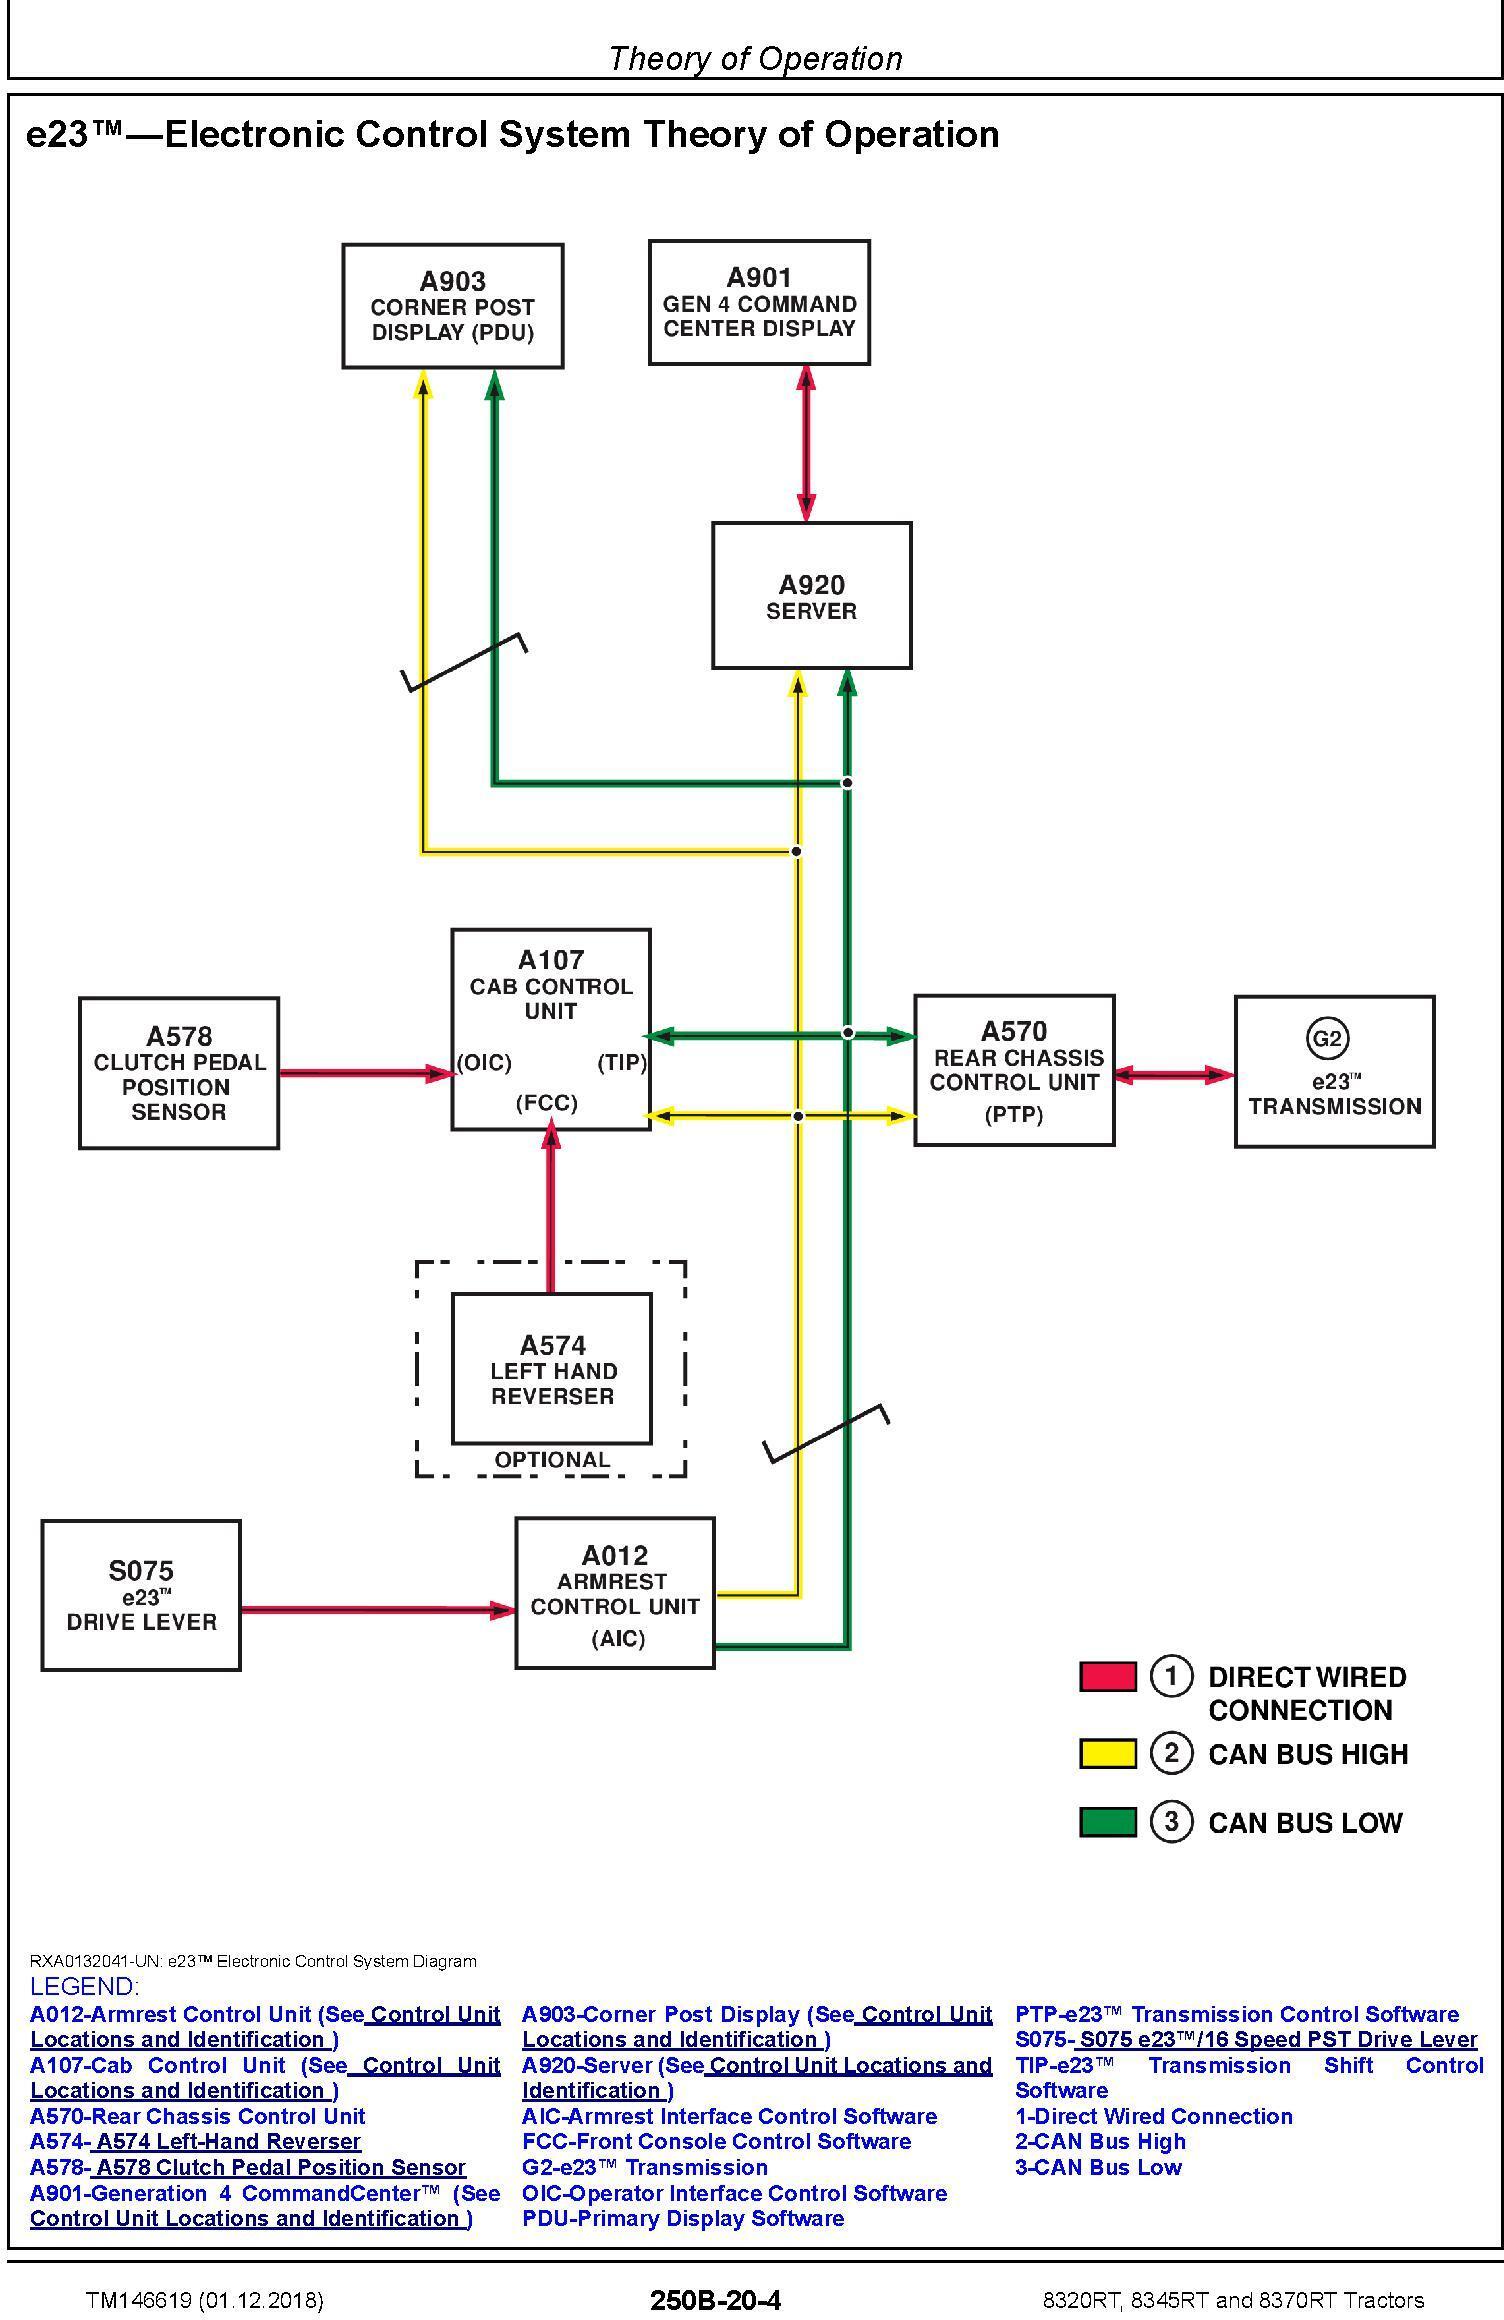 John Deere 8320RT, 8345RT, 8370RT Tractors (SN.917000-920000) Diagnostic Technical Manual (TM146619) - 3